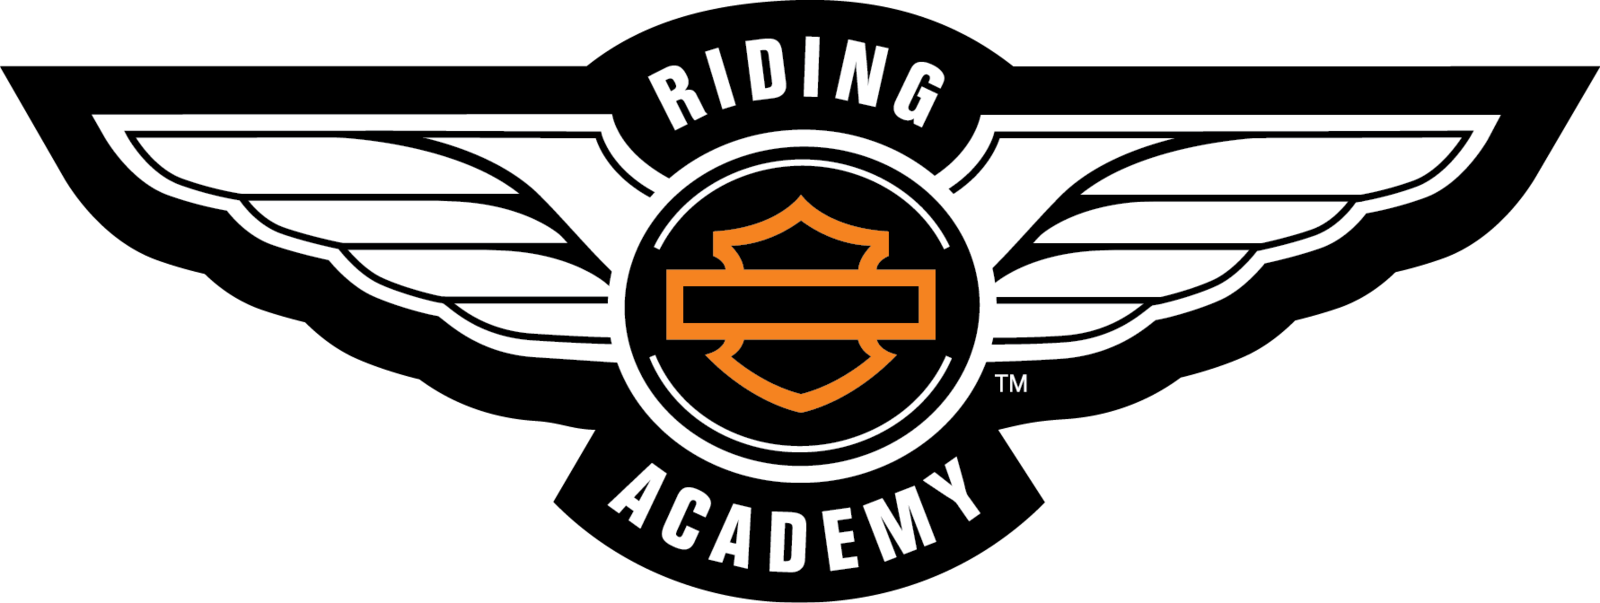 Harley Davidson Logo Riding Academy Png - Harley Davidson Riding Academy Logo (1600x603), Png Download